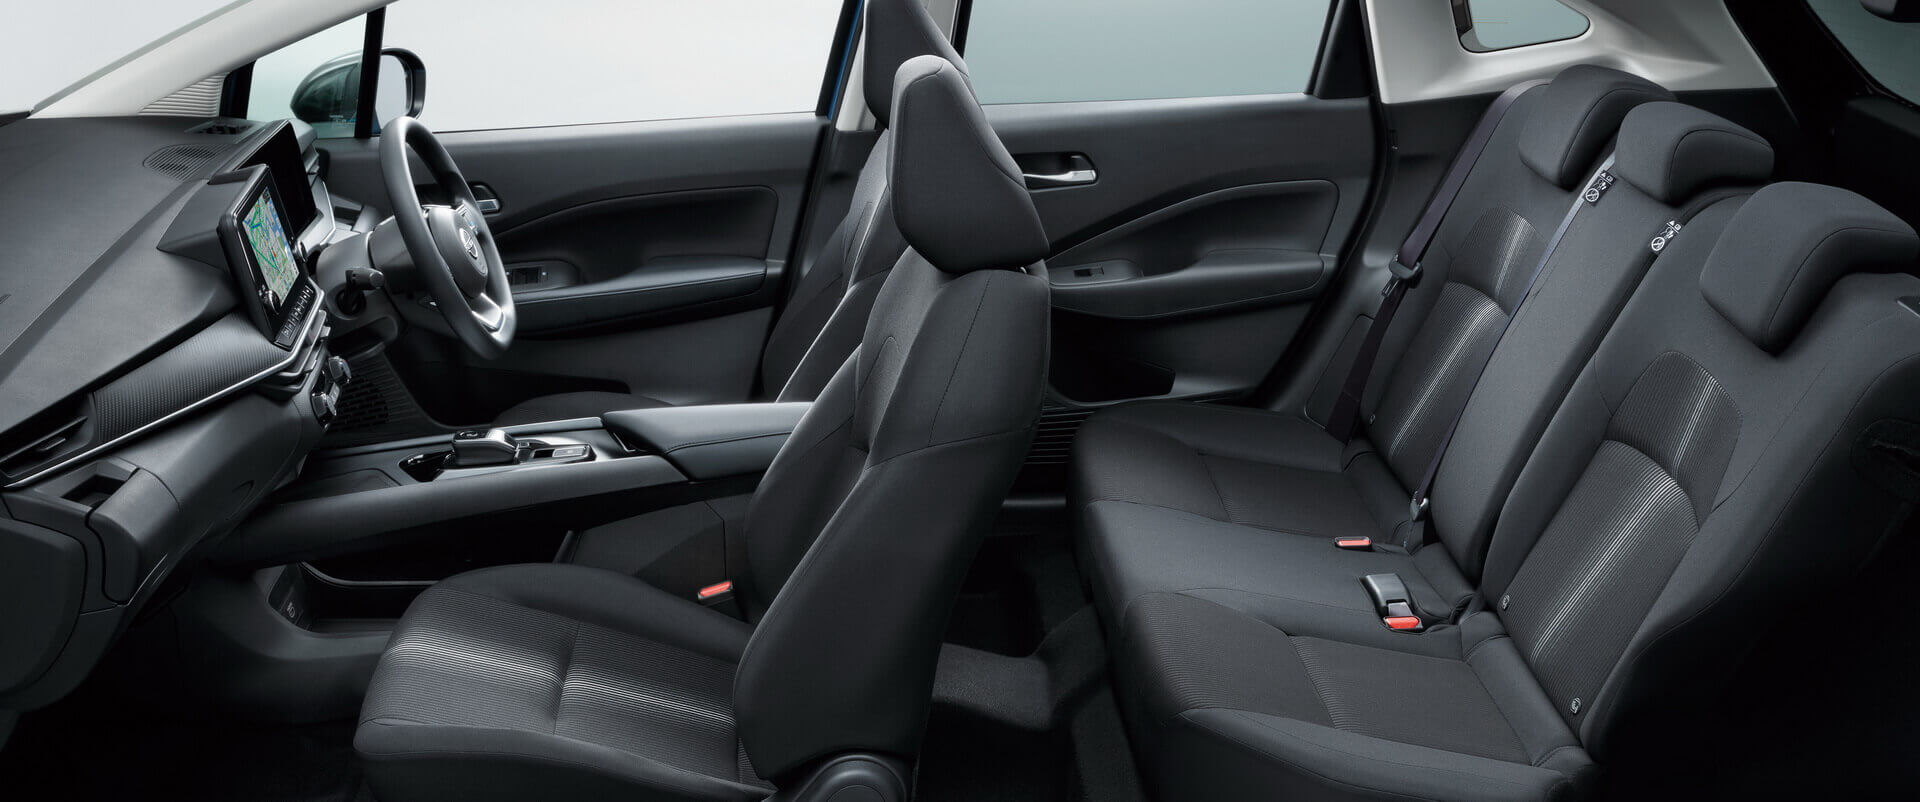 Салон Nissan Note e-POWER 2021